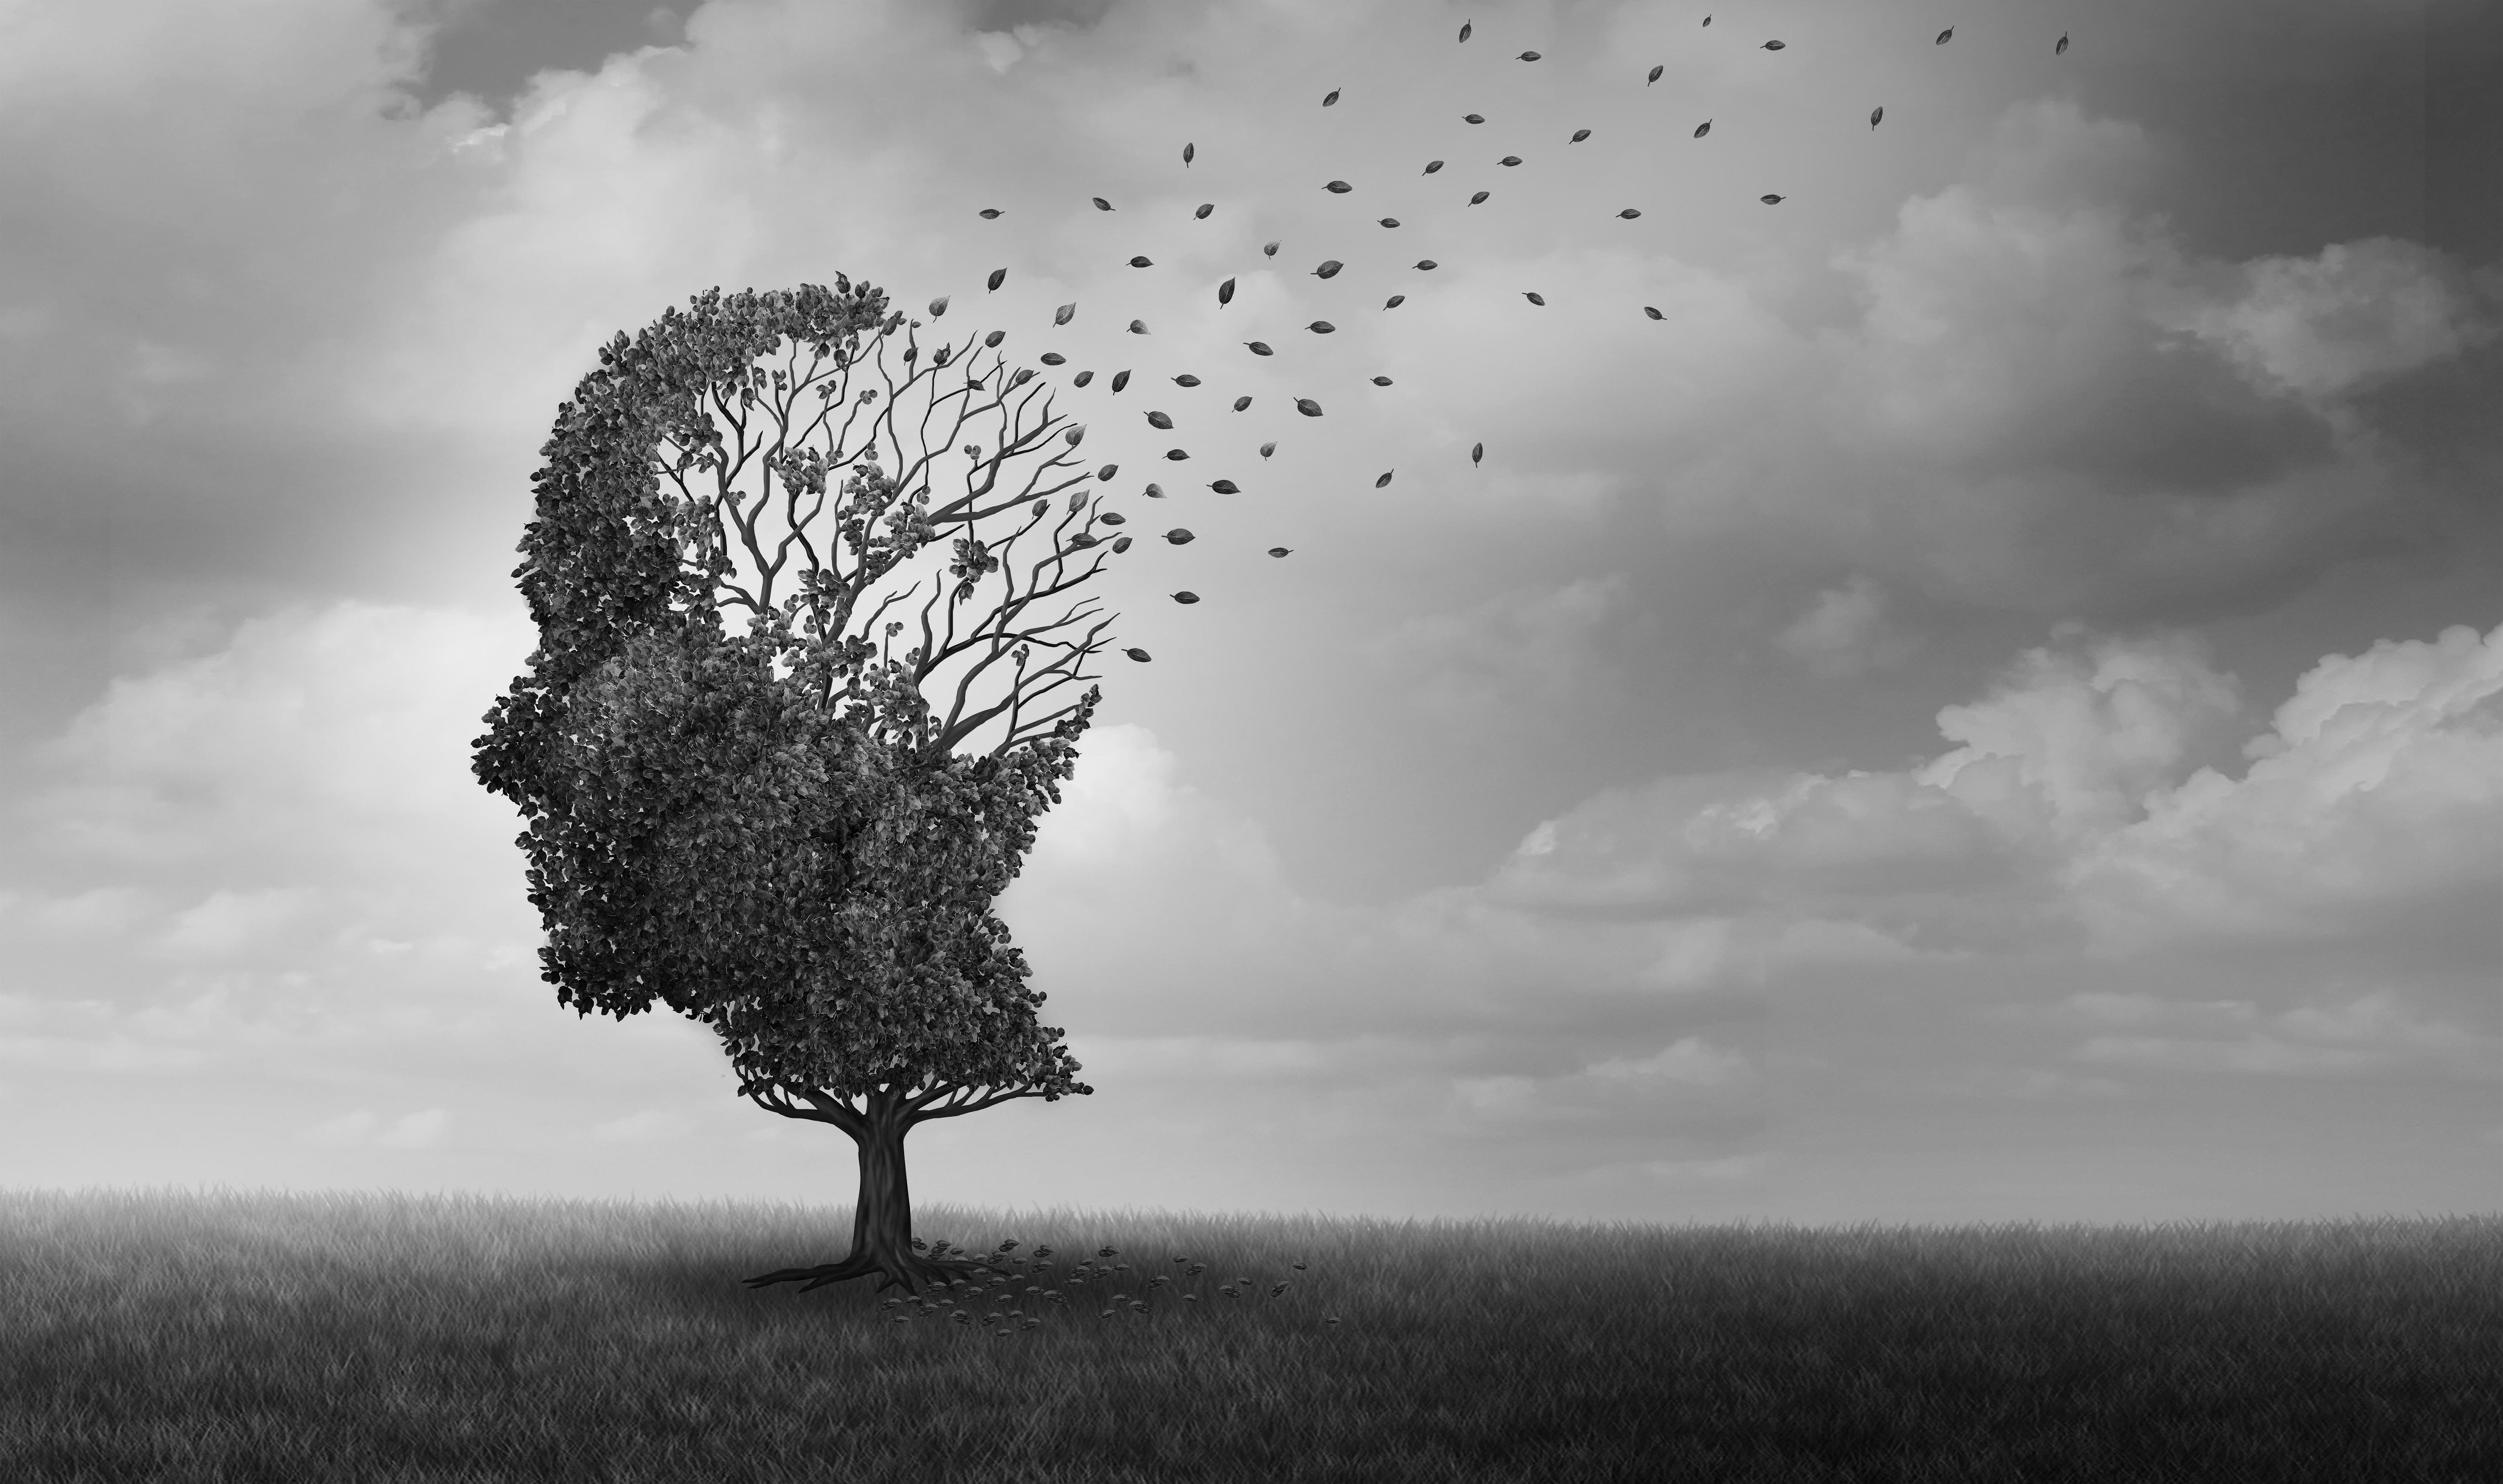 Alzheimer disease as a neuropathology memory loss due to brain degeneration and decline as a surreal medical neurology illness concept.